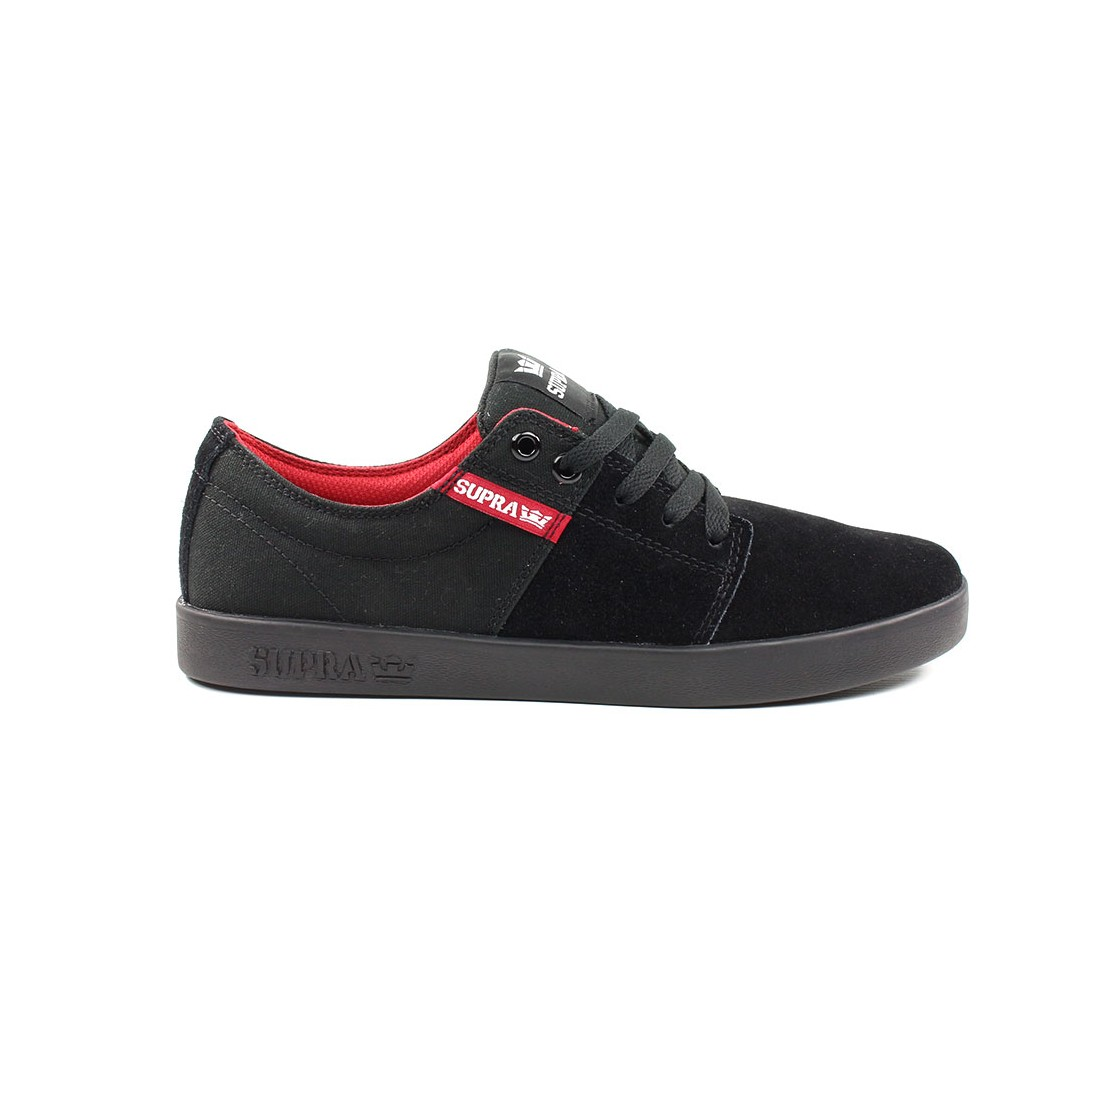 STACKS II black red black